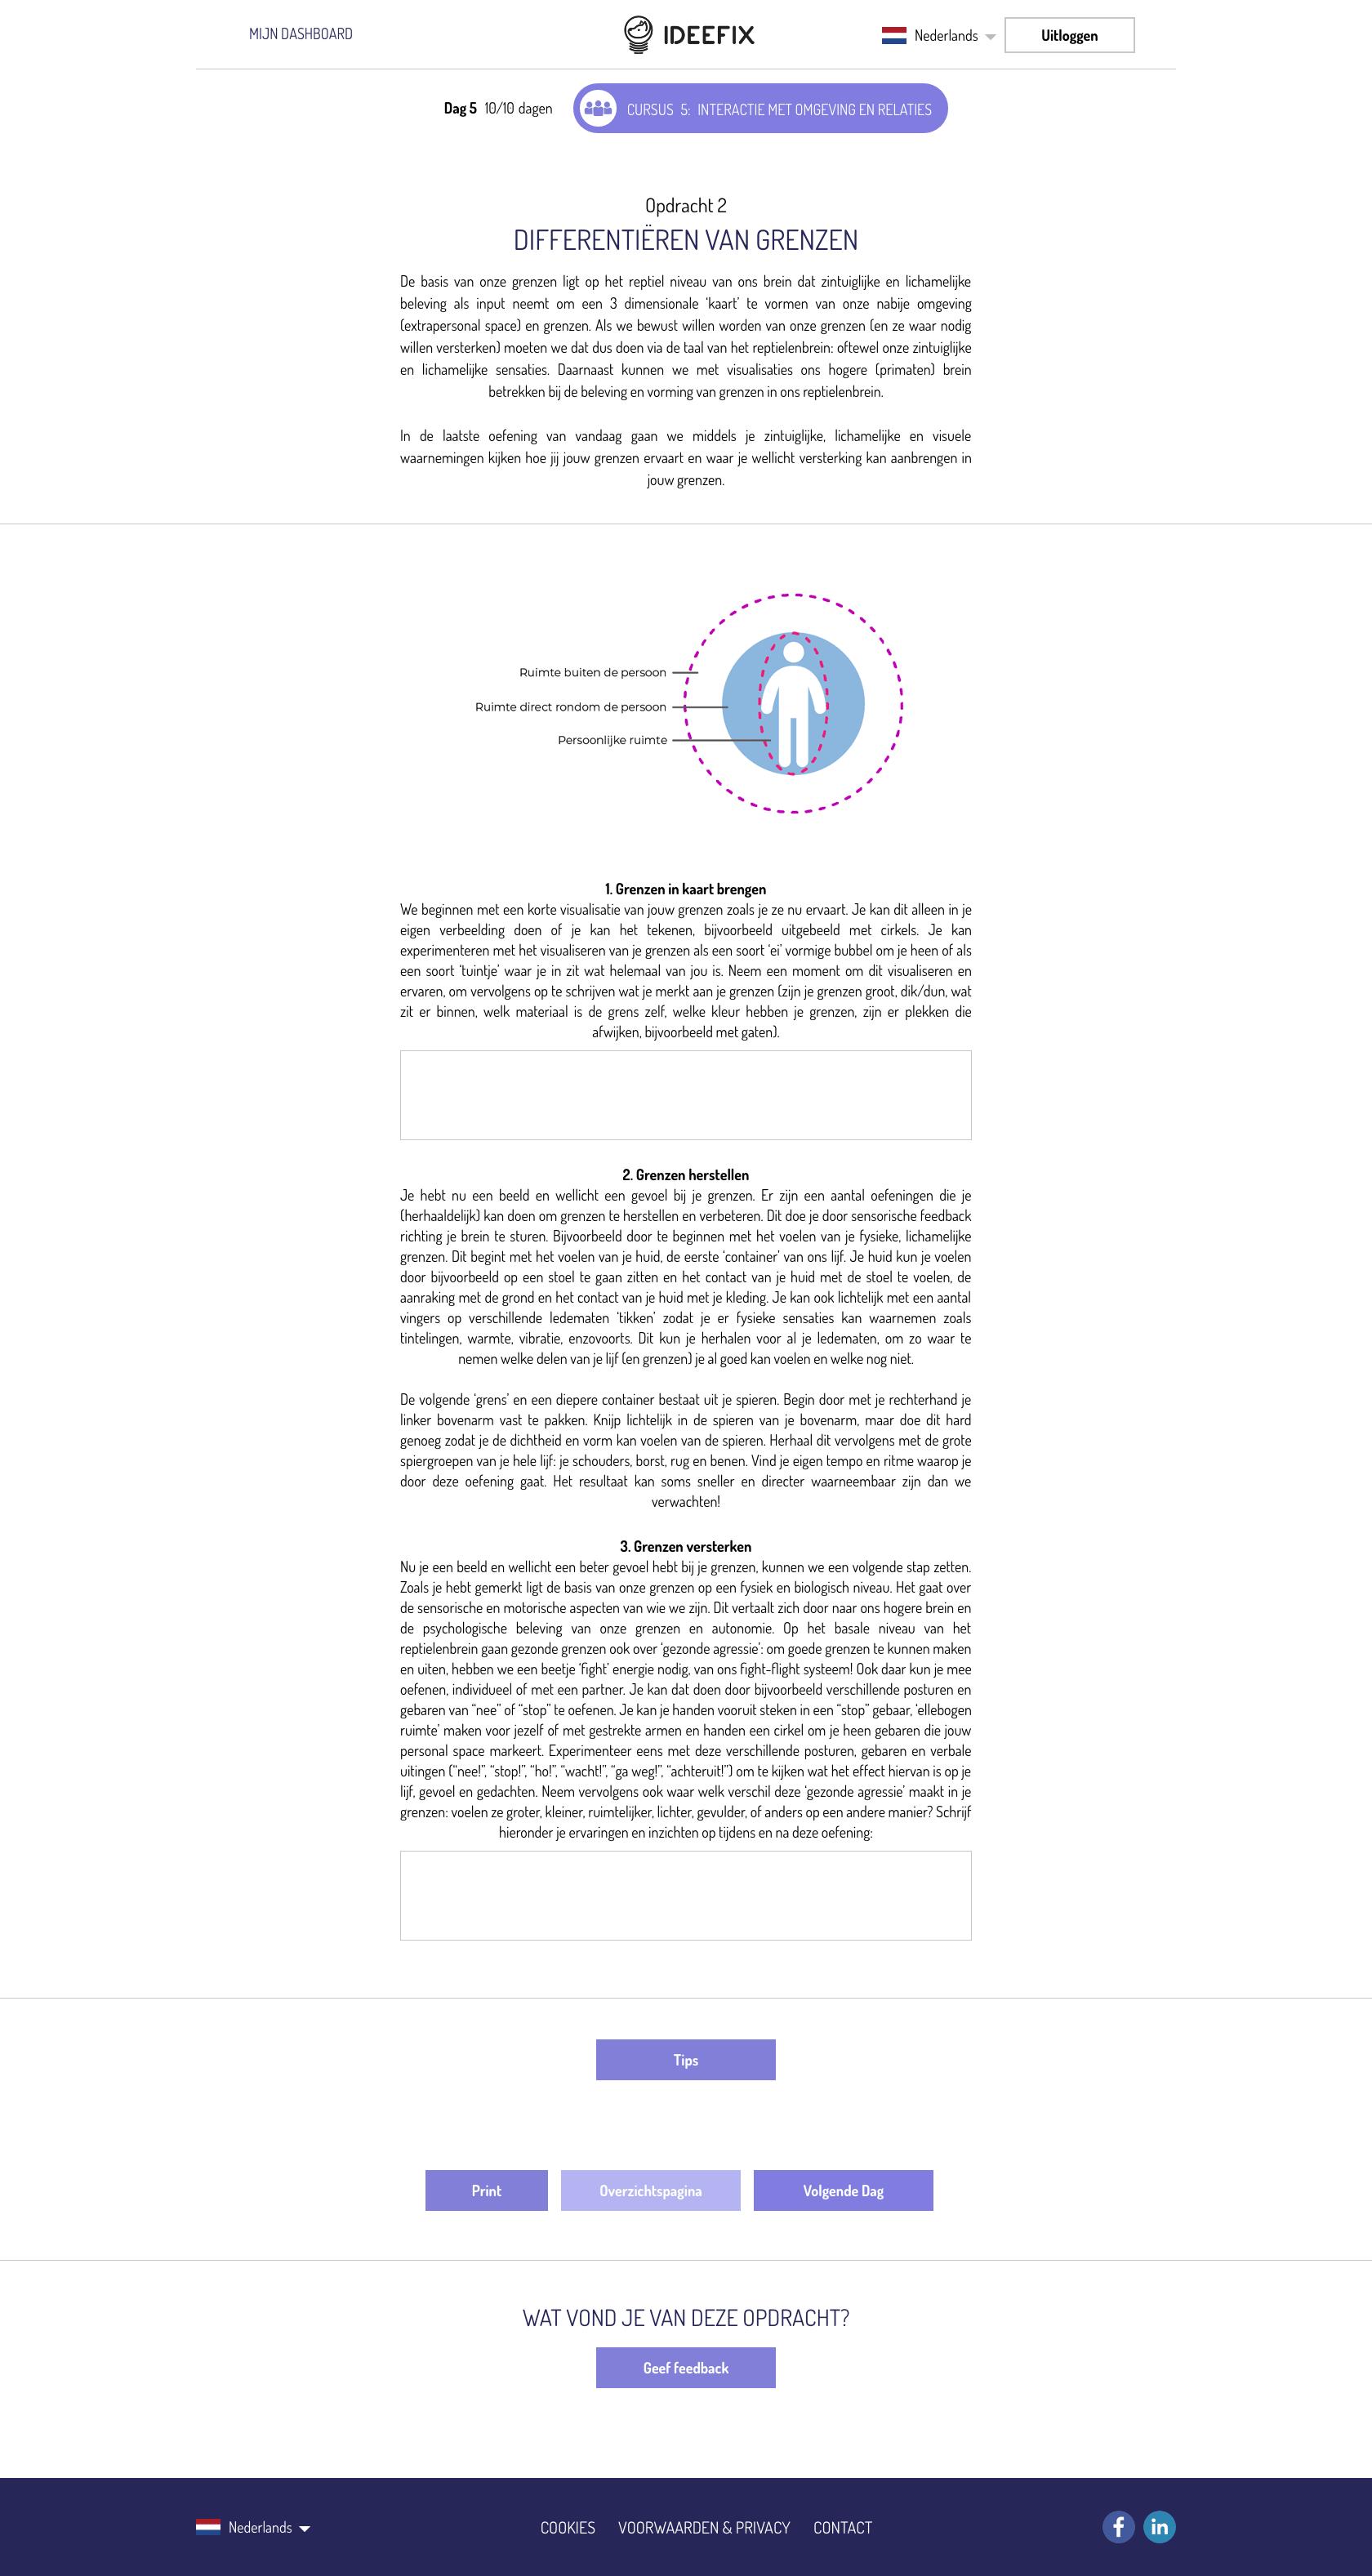 https://ideefix-cdn.s3.eu-central-1.amazonaws.com/module_screenshot/WoGXKVWfkTcWTsugPcCm_picture.png